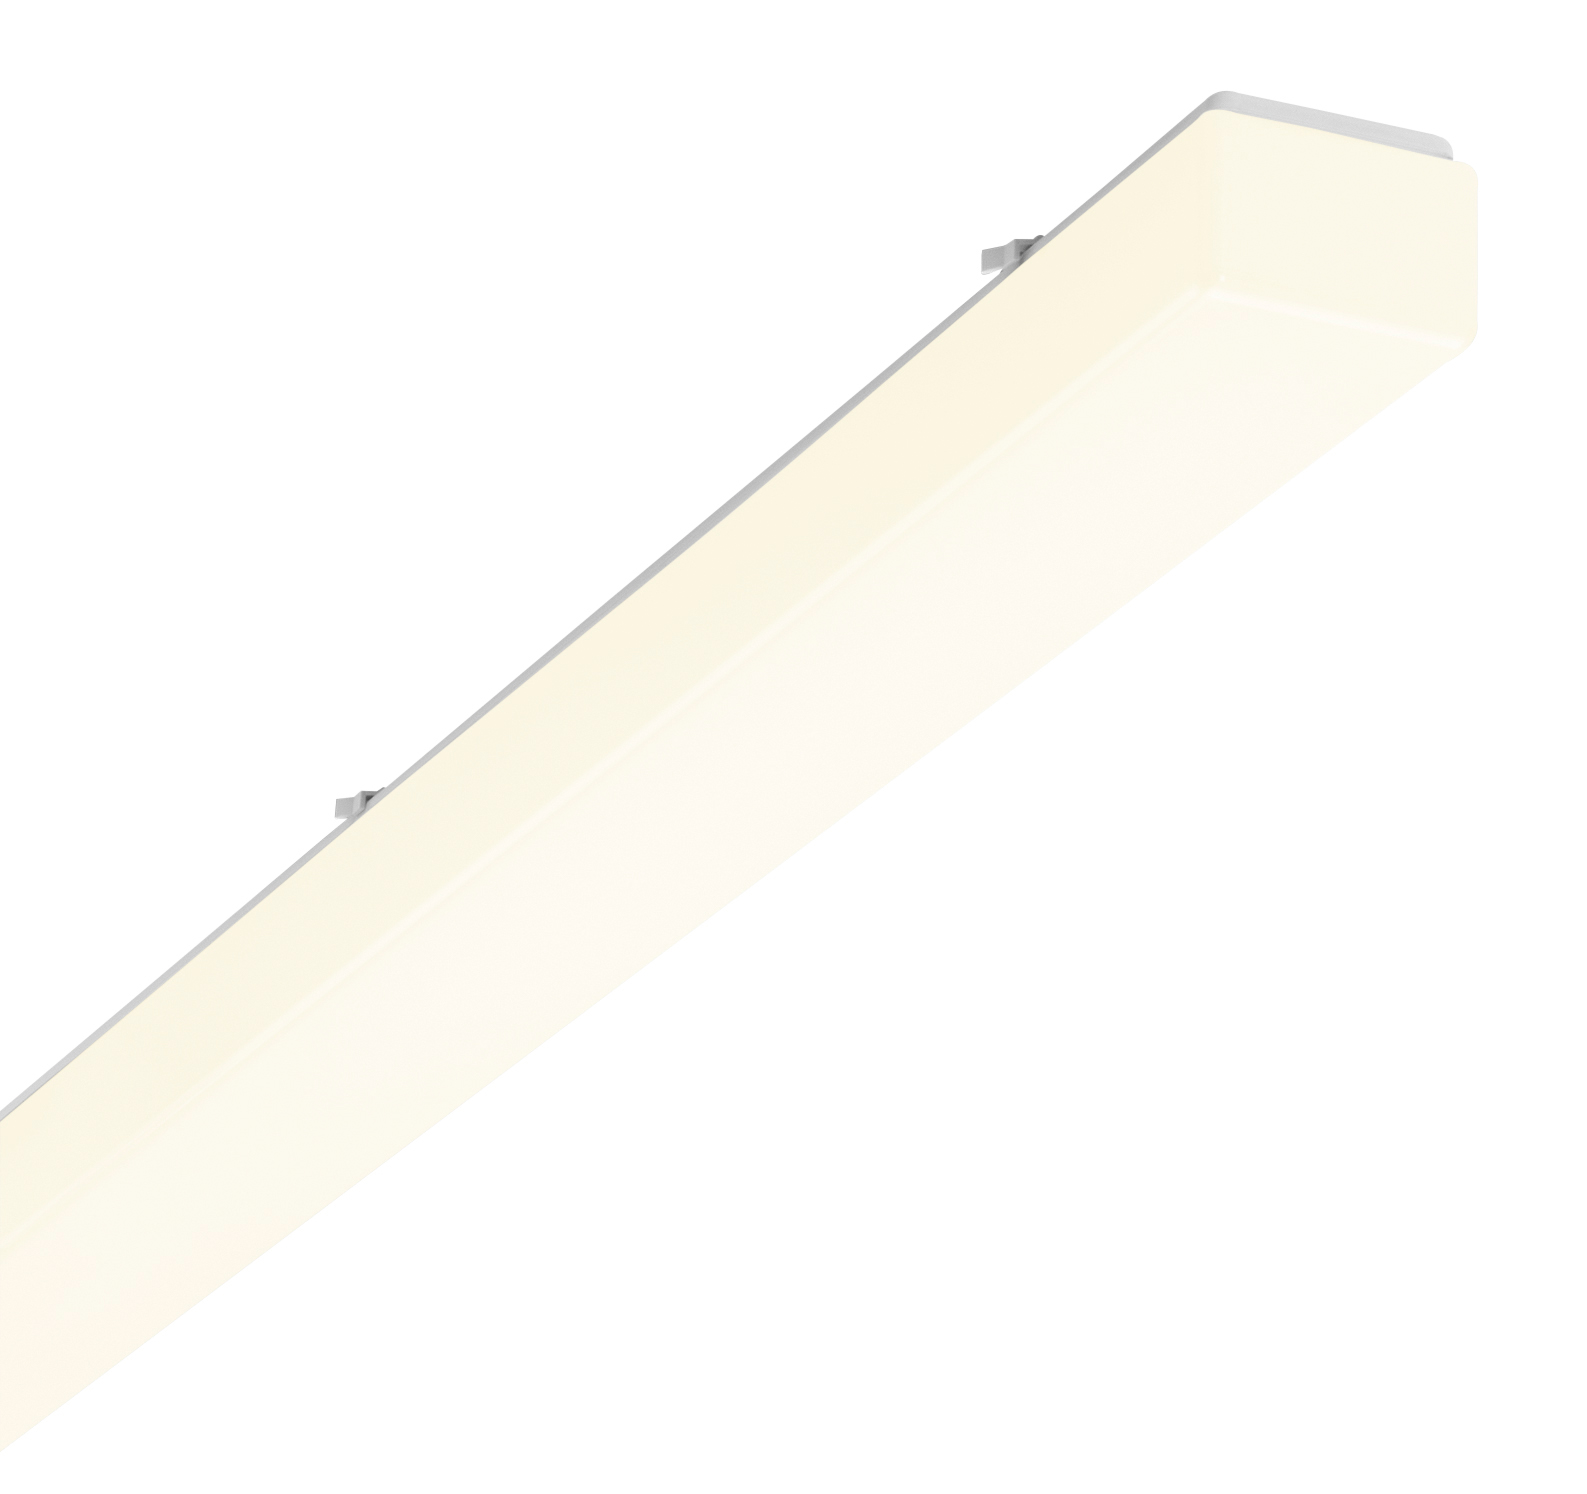 1 Stk AOT-O LED 62W, 4000K, IP50, acryl, opal, weiß, L-1560mm LI70122062